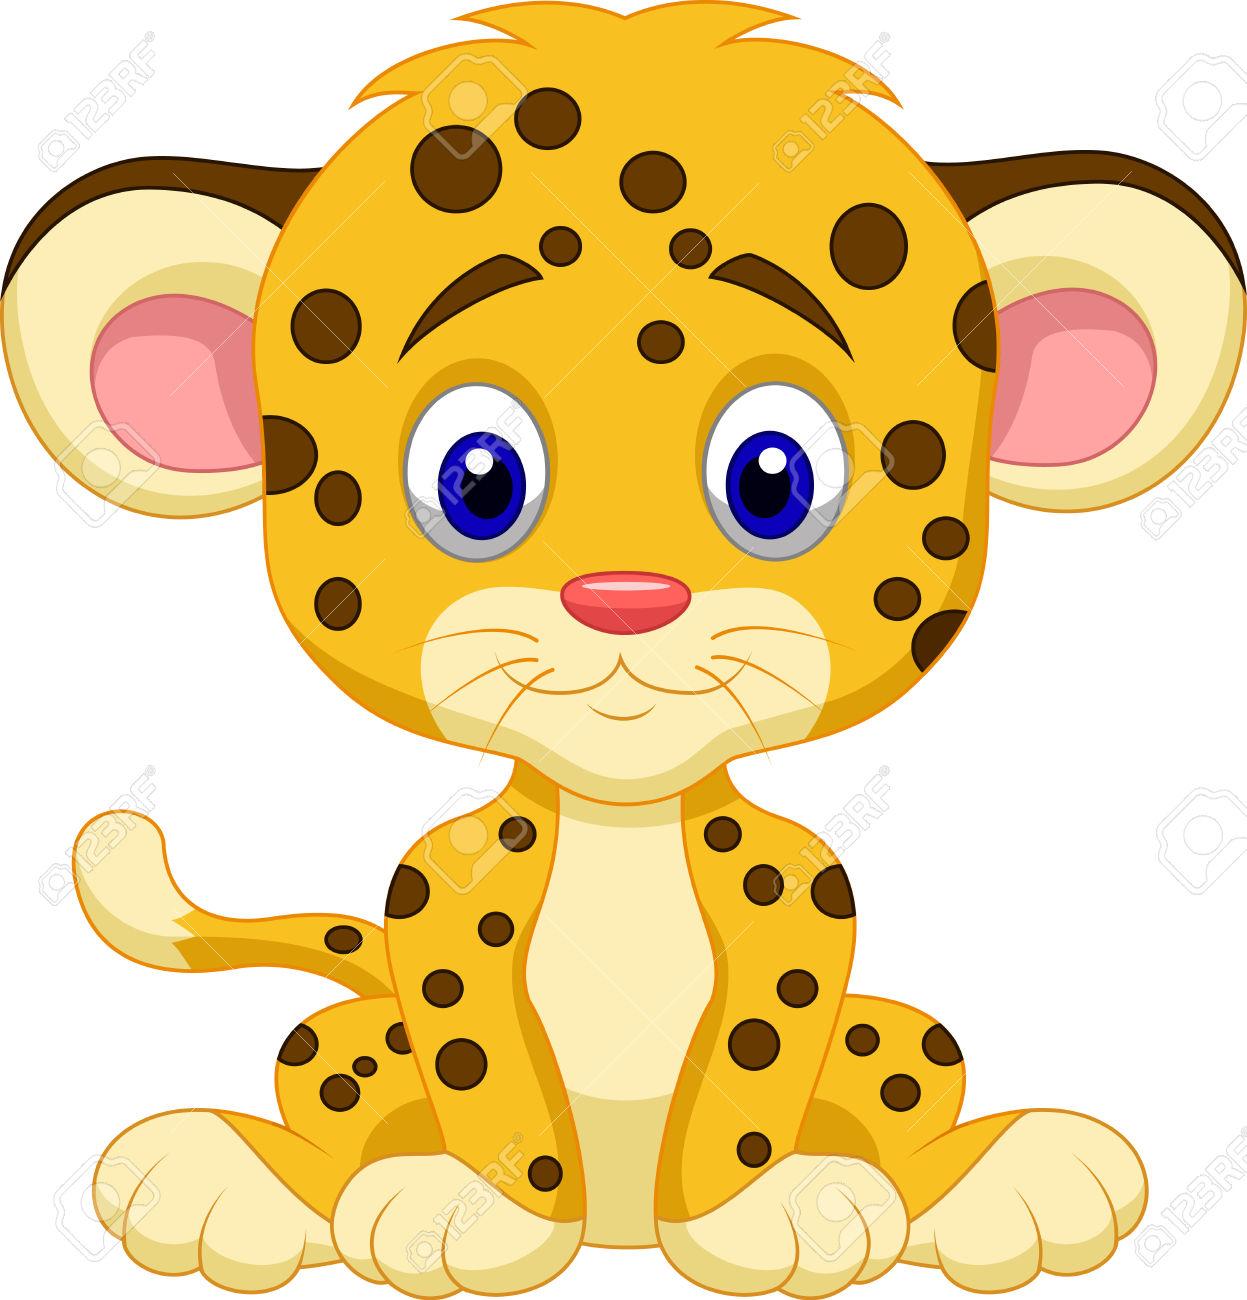 Amur Leopard clipart #13, Download drawings